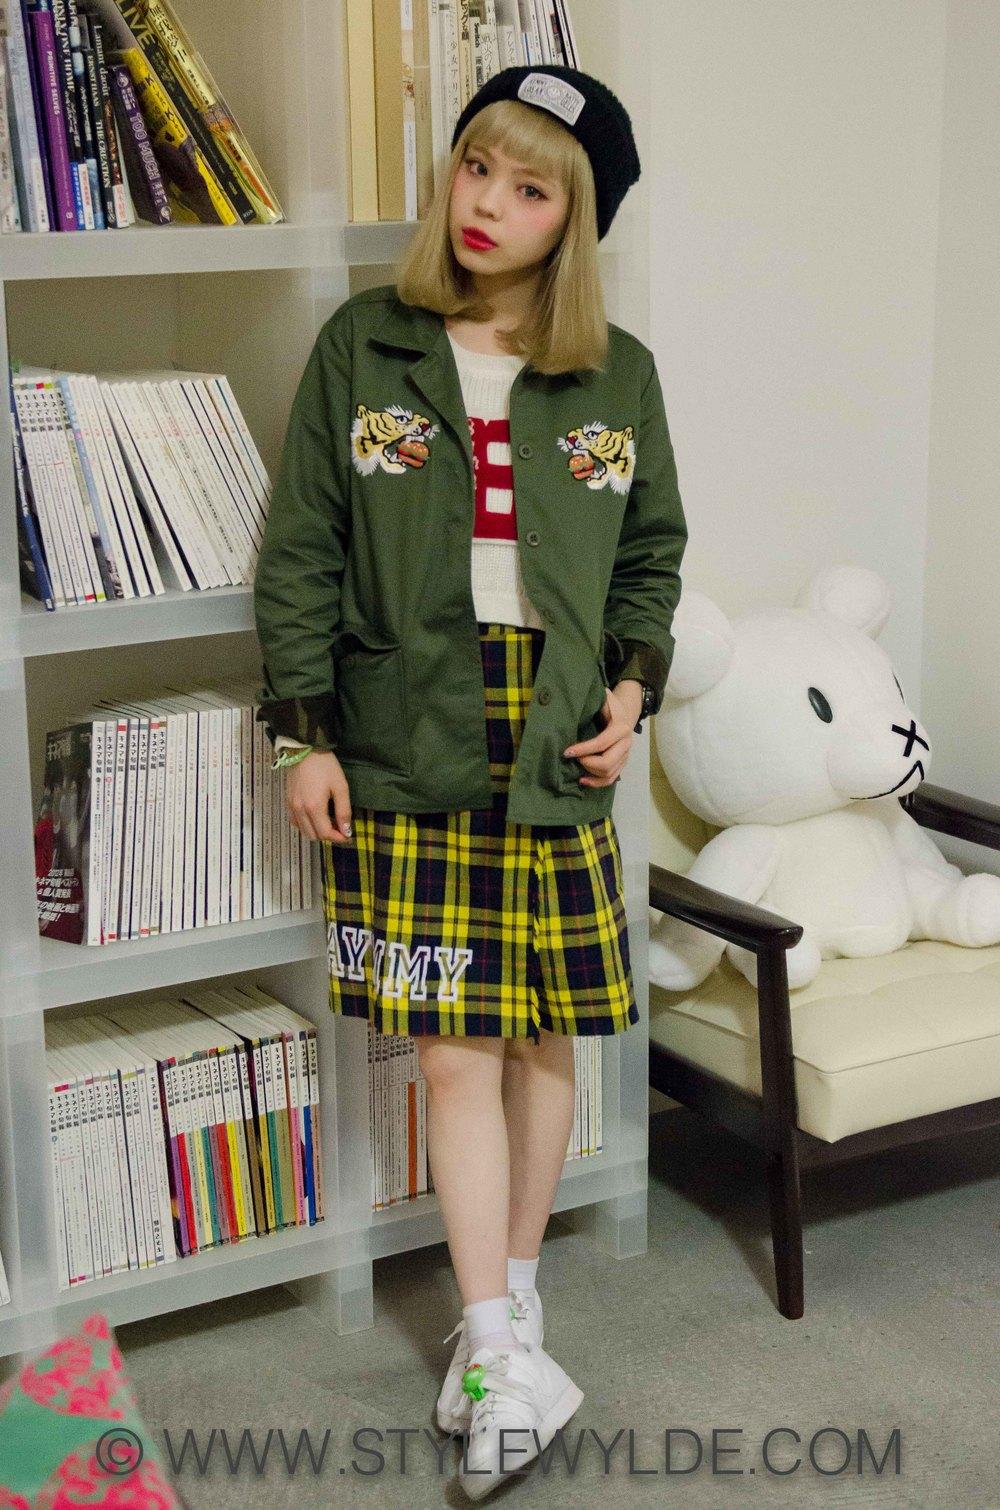 StyleWylde_Asobi_Interviews_CHA2 (6 of 8).jpg